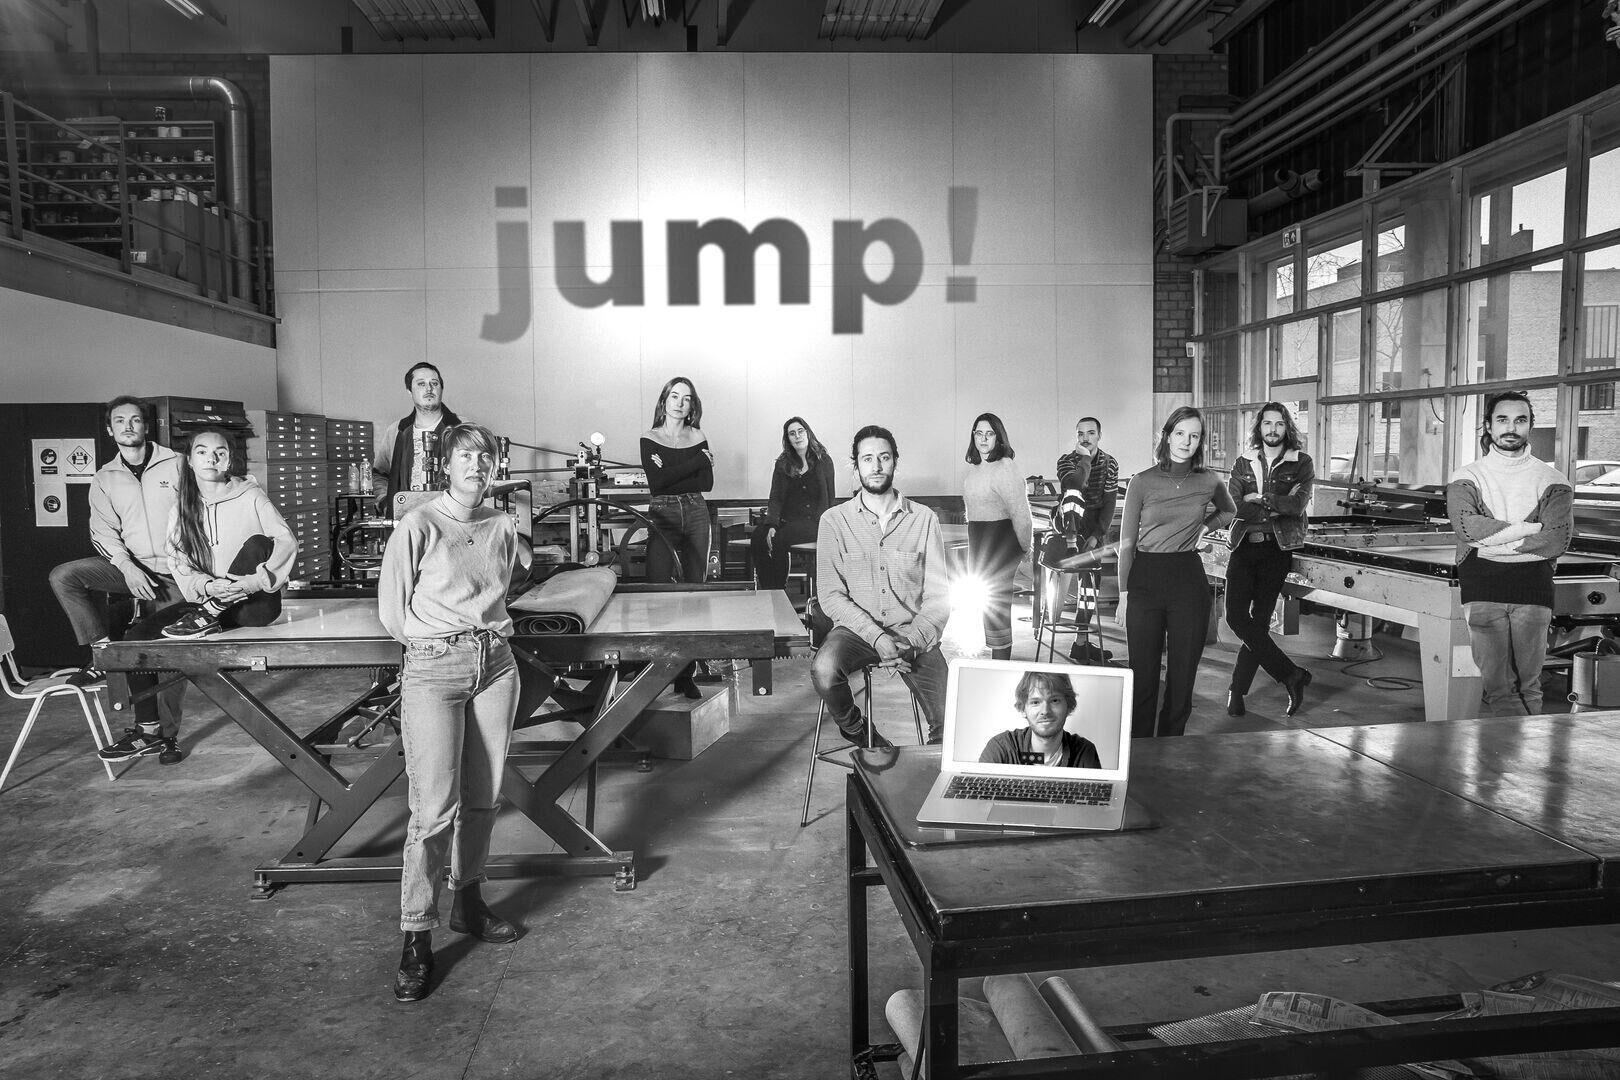 jump-2021-the-talents-s1920x1080